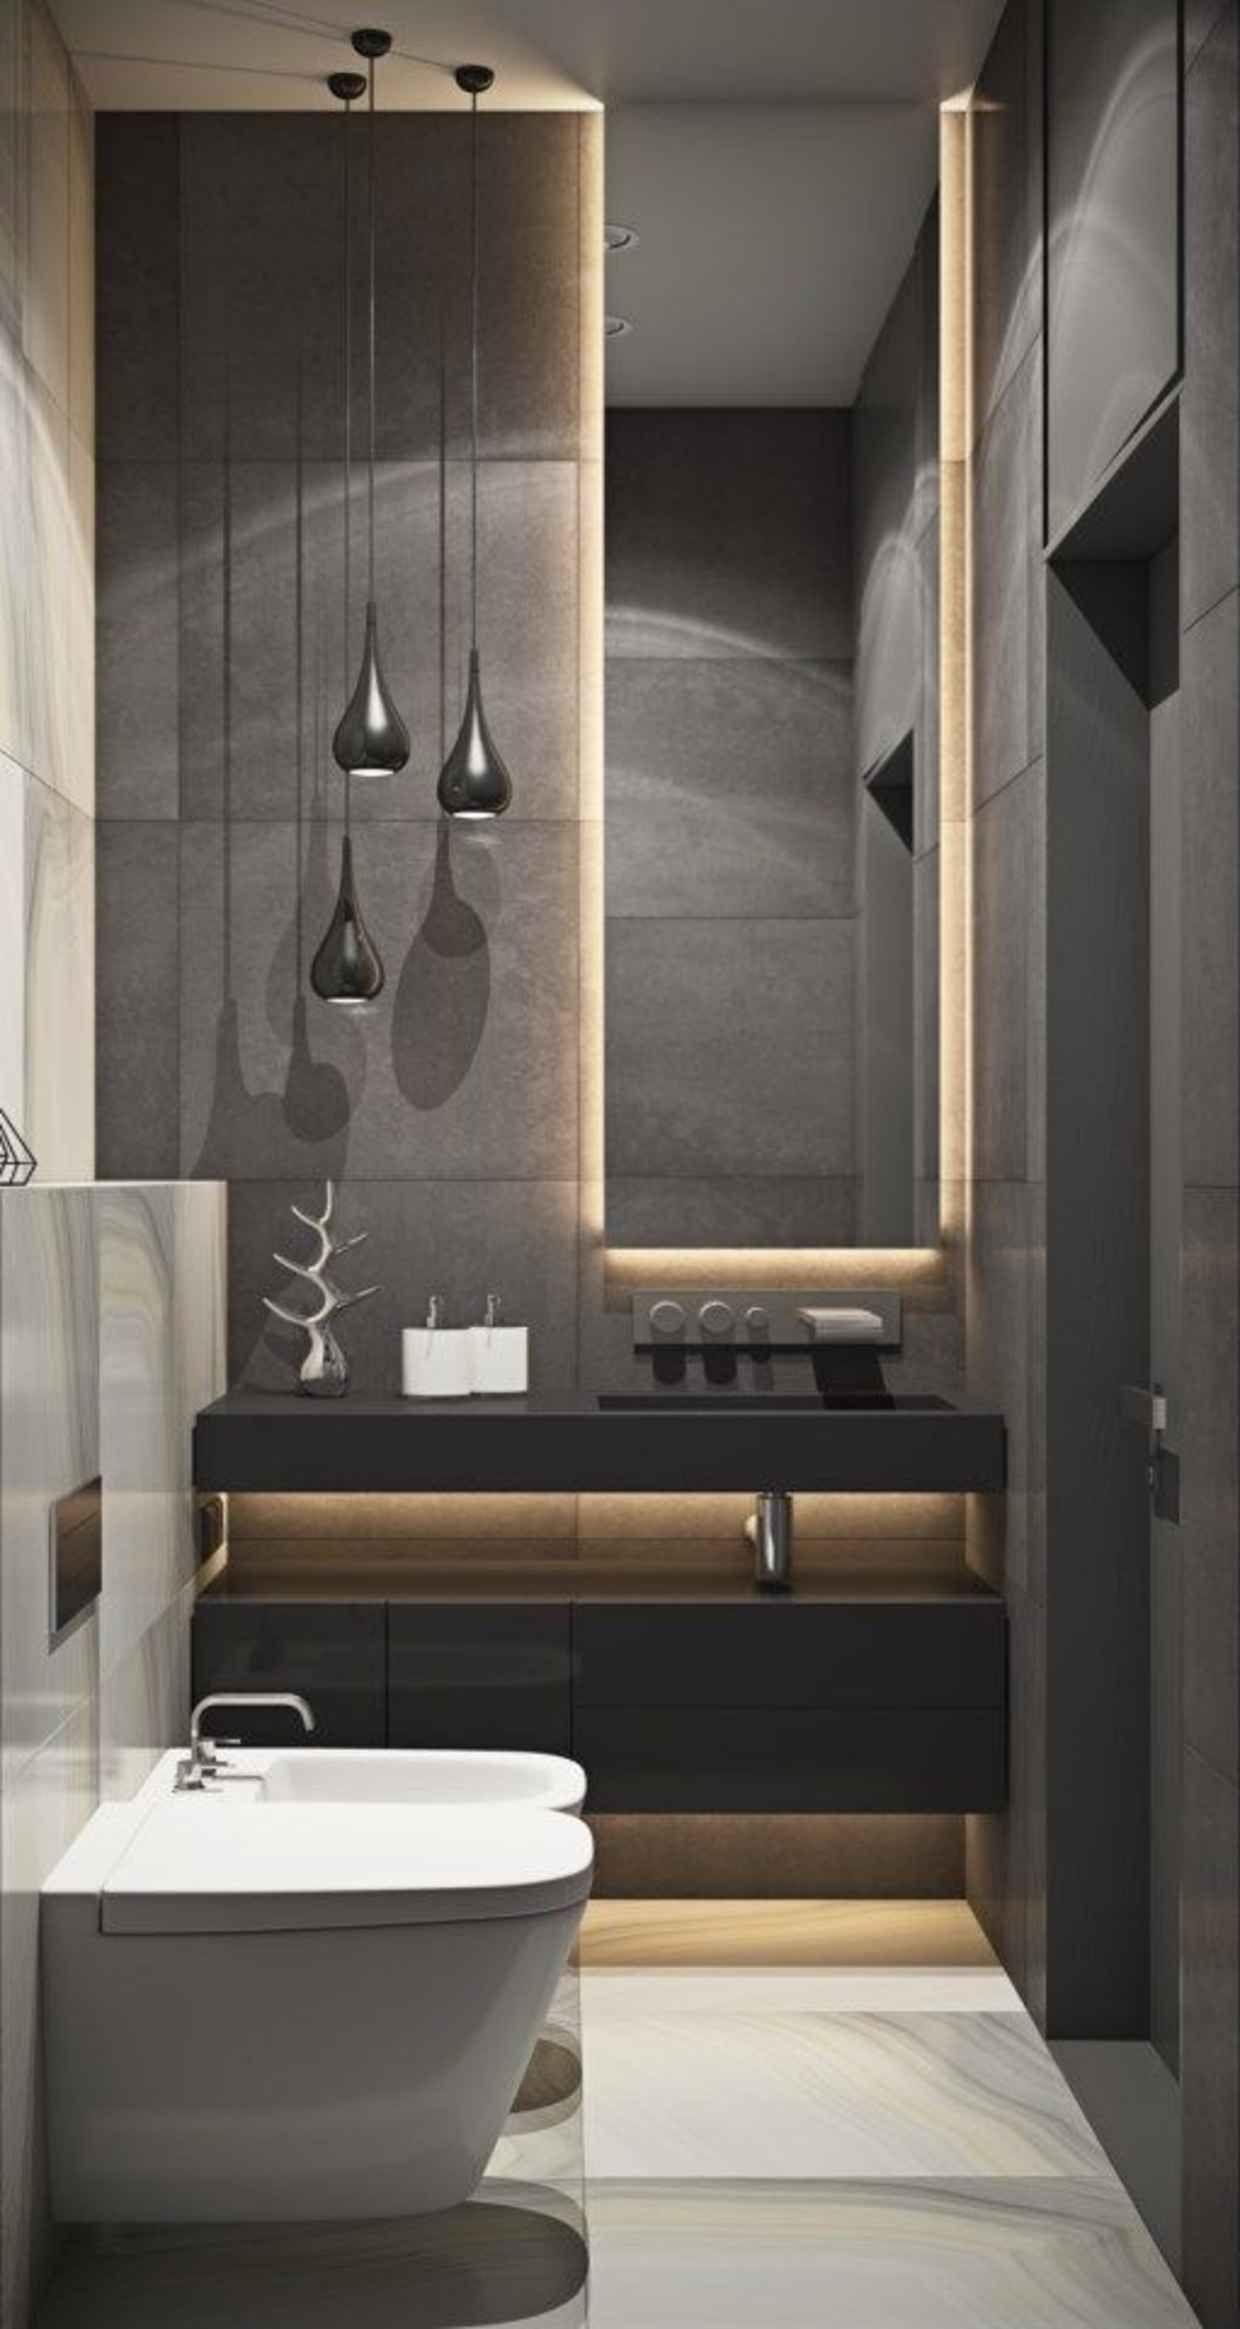 Random Inspiration 255 | Random, Inspiration and Interiors for Modern Powder Room Tile  150ifm